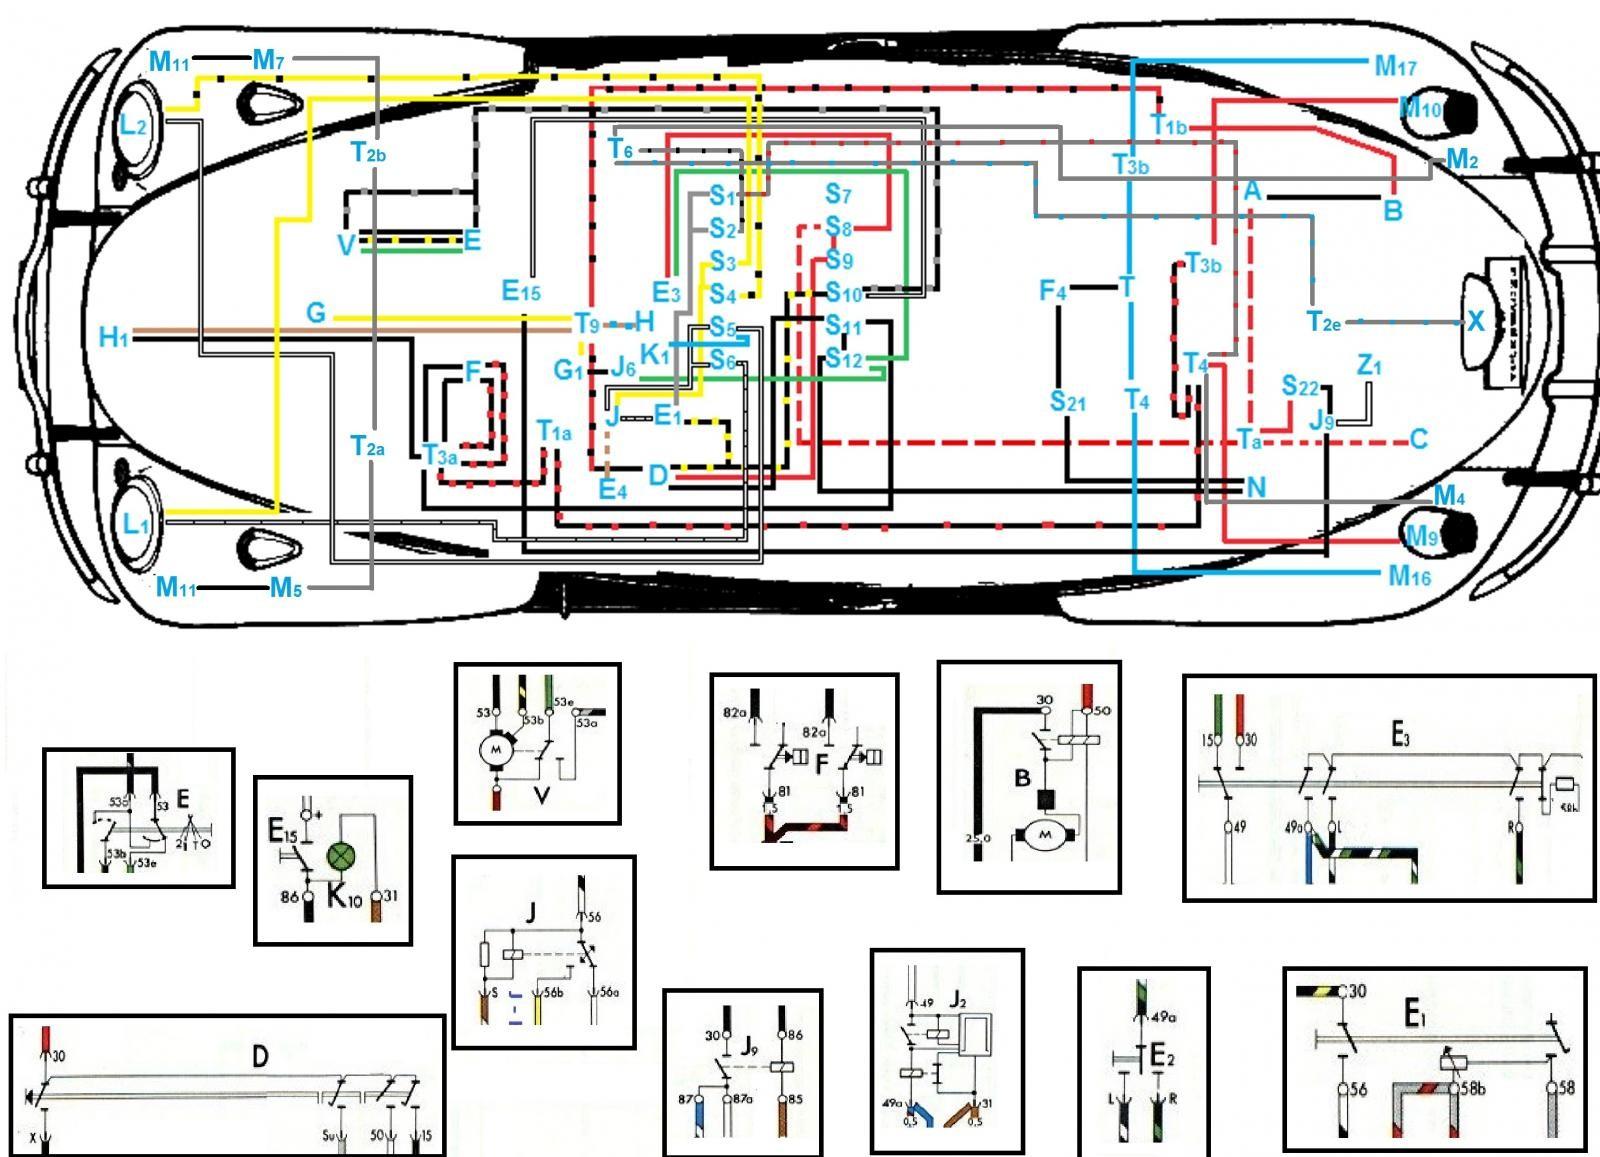 Vw Touran Wiring Diagram Pdf - Changing A Fuse In A Wylex Fuse Box -  2005ram.tukune.jeanjaures37.frWiring Diagram Resource